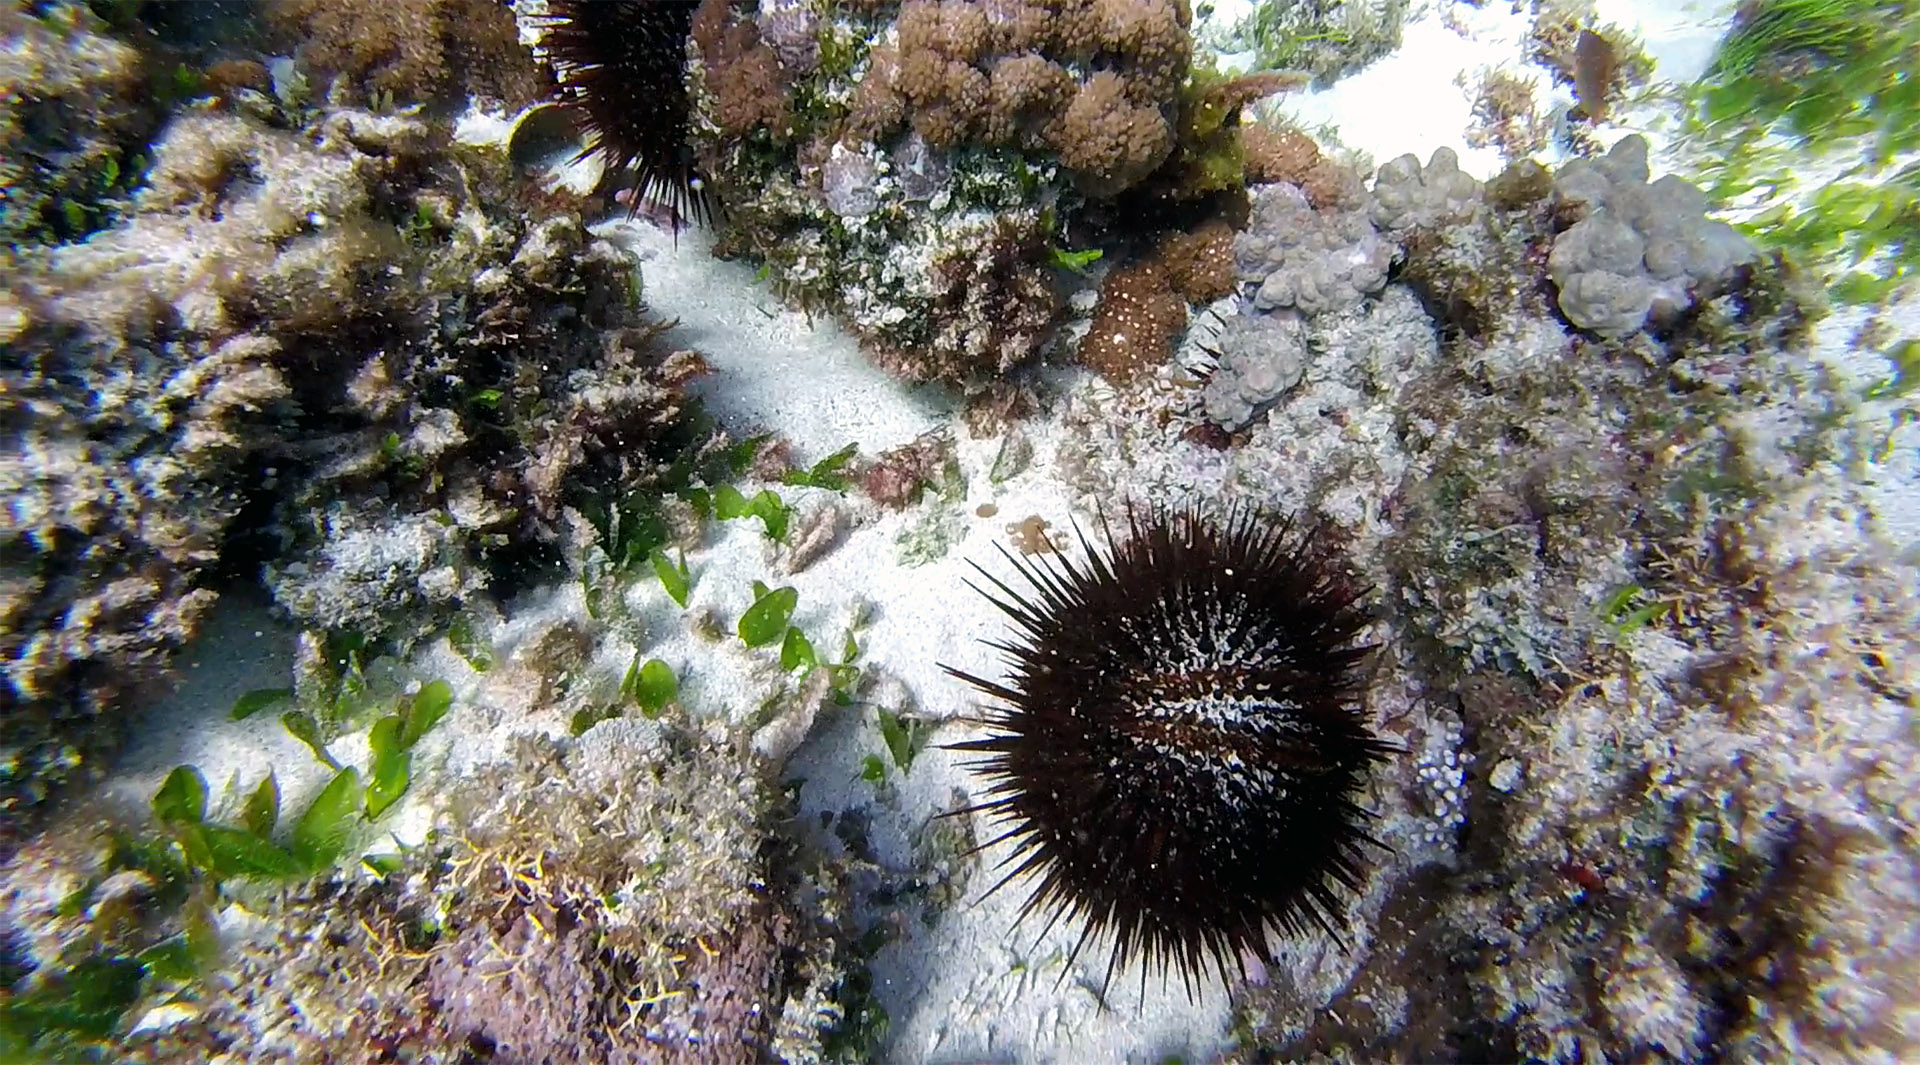 Long-spine urchin